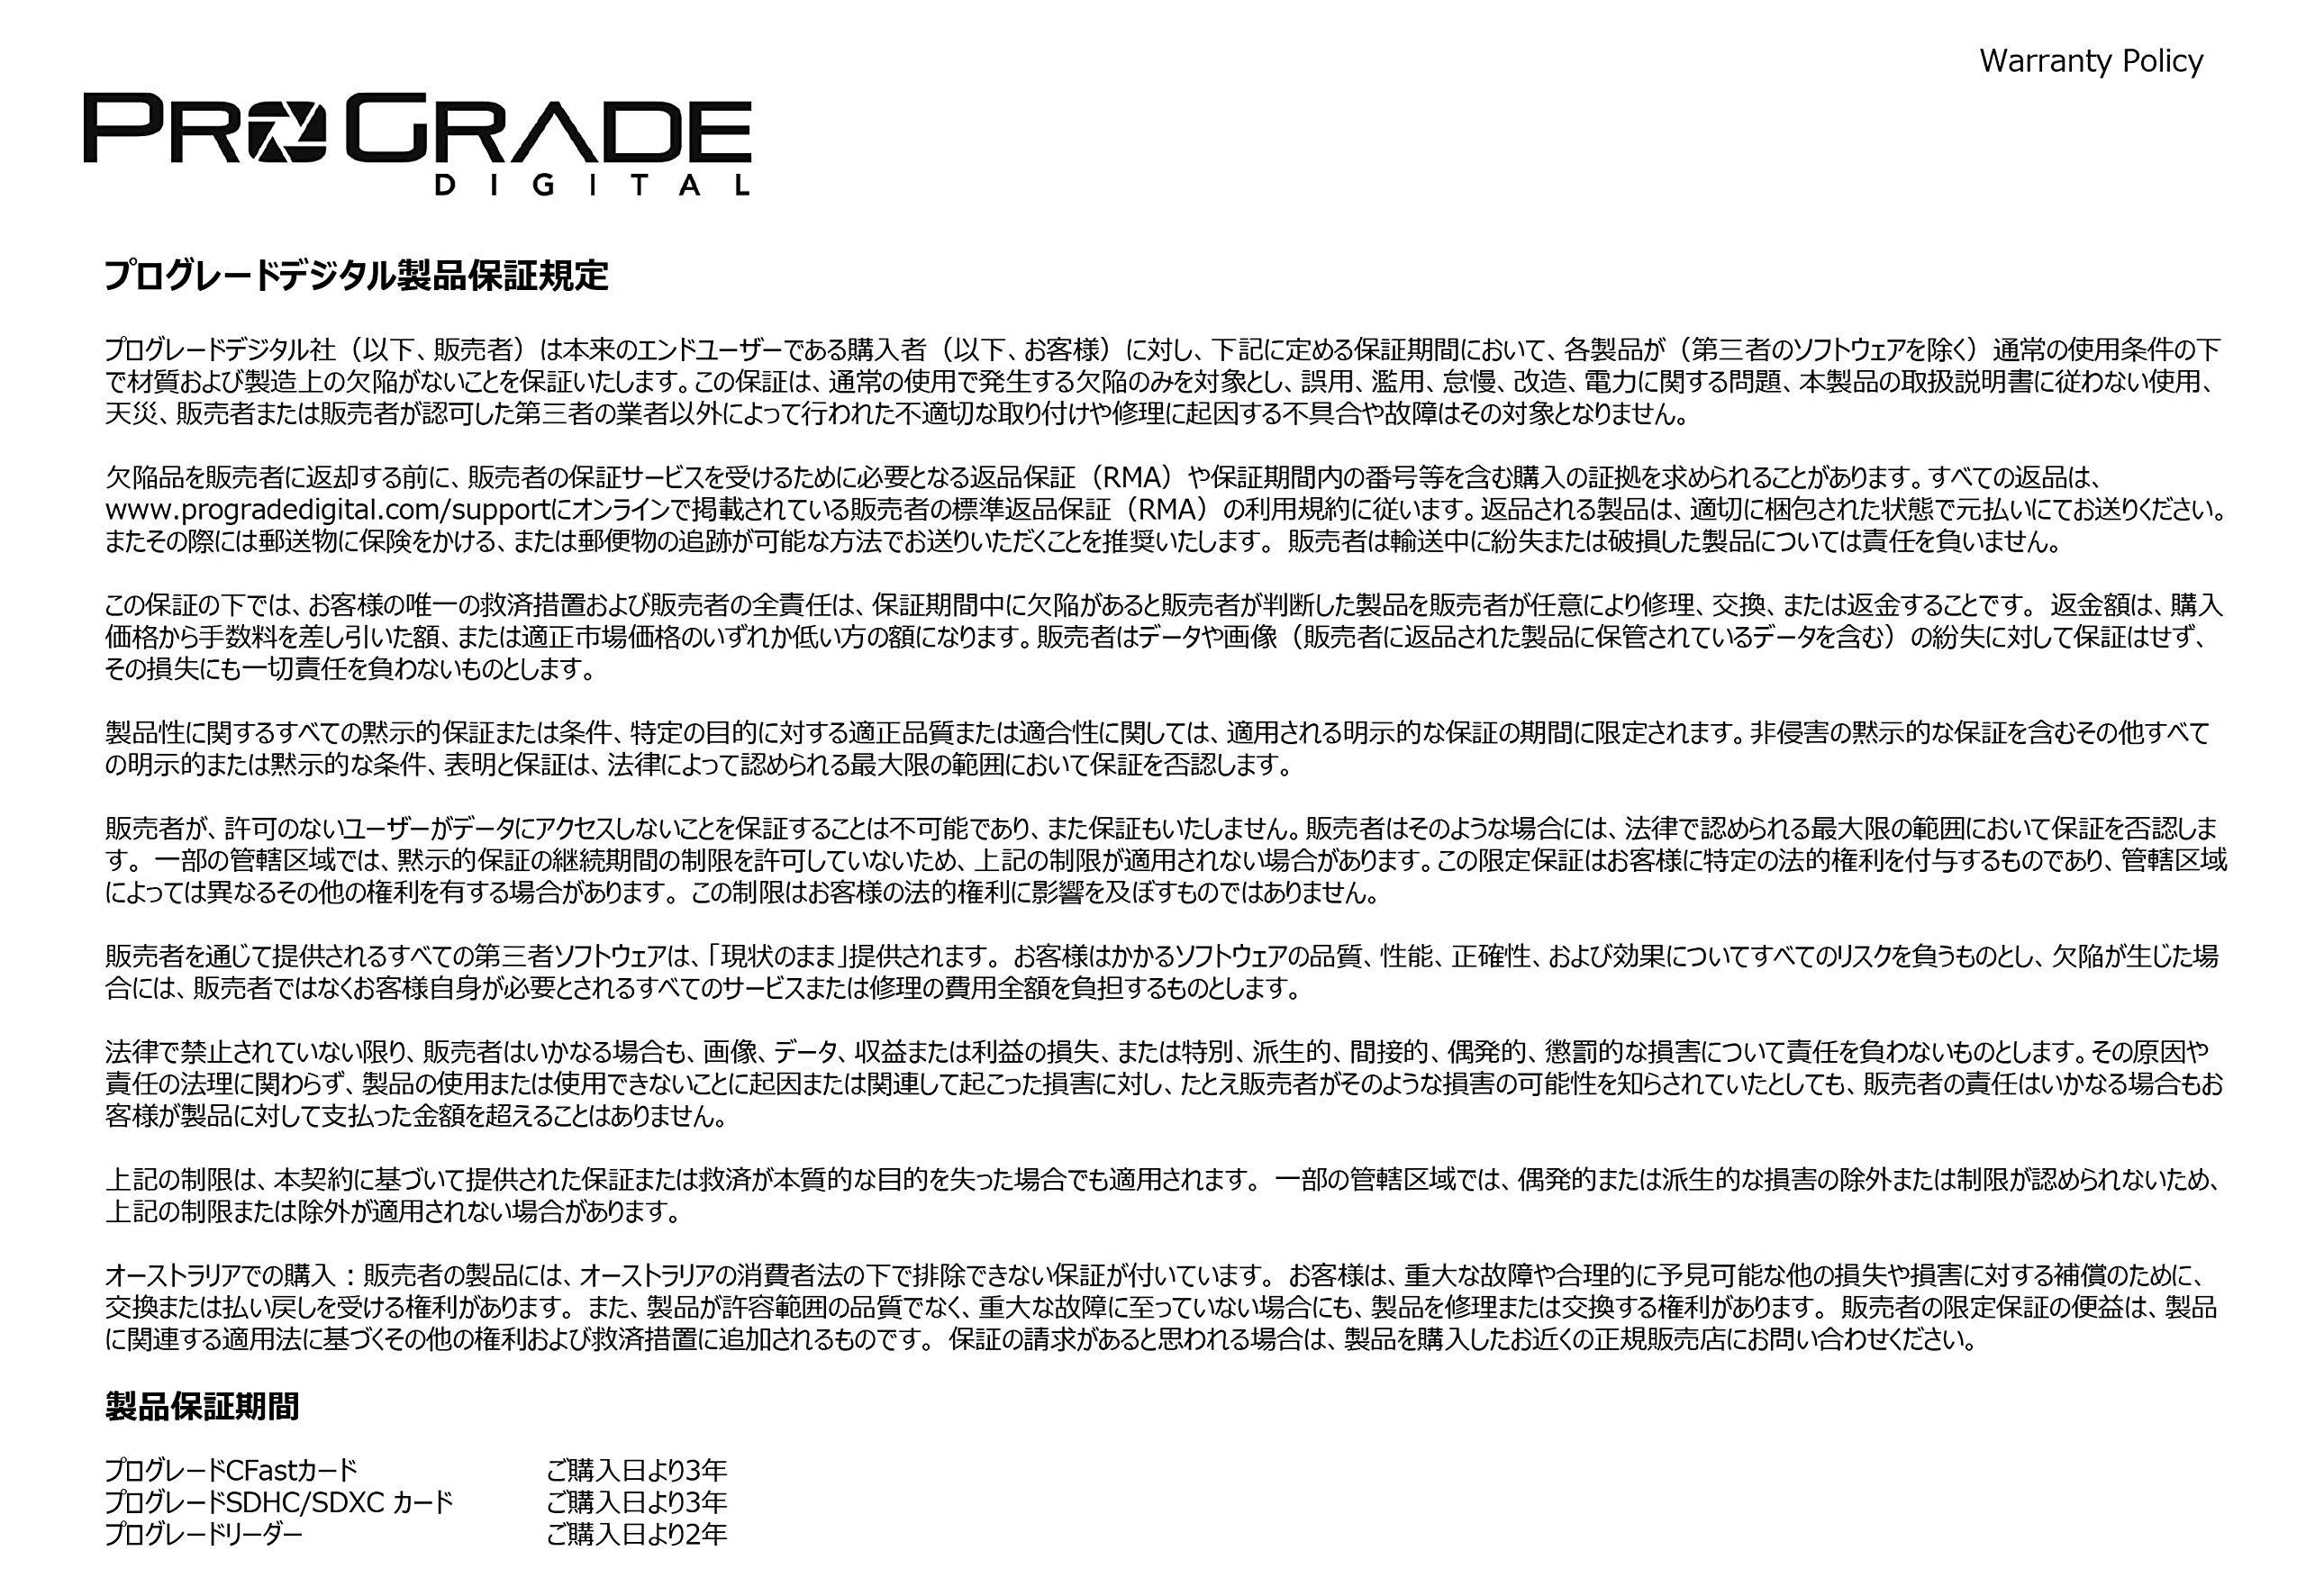 ProGrade Digital 200MB/s Micro SDXC UHS-II V60 Memory Card (128GB) by ProGrade Digital